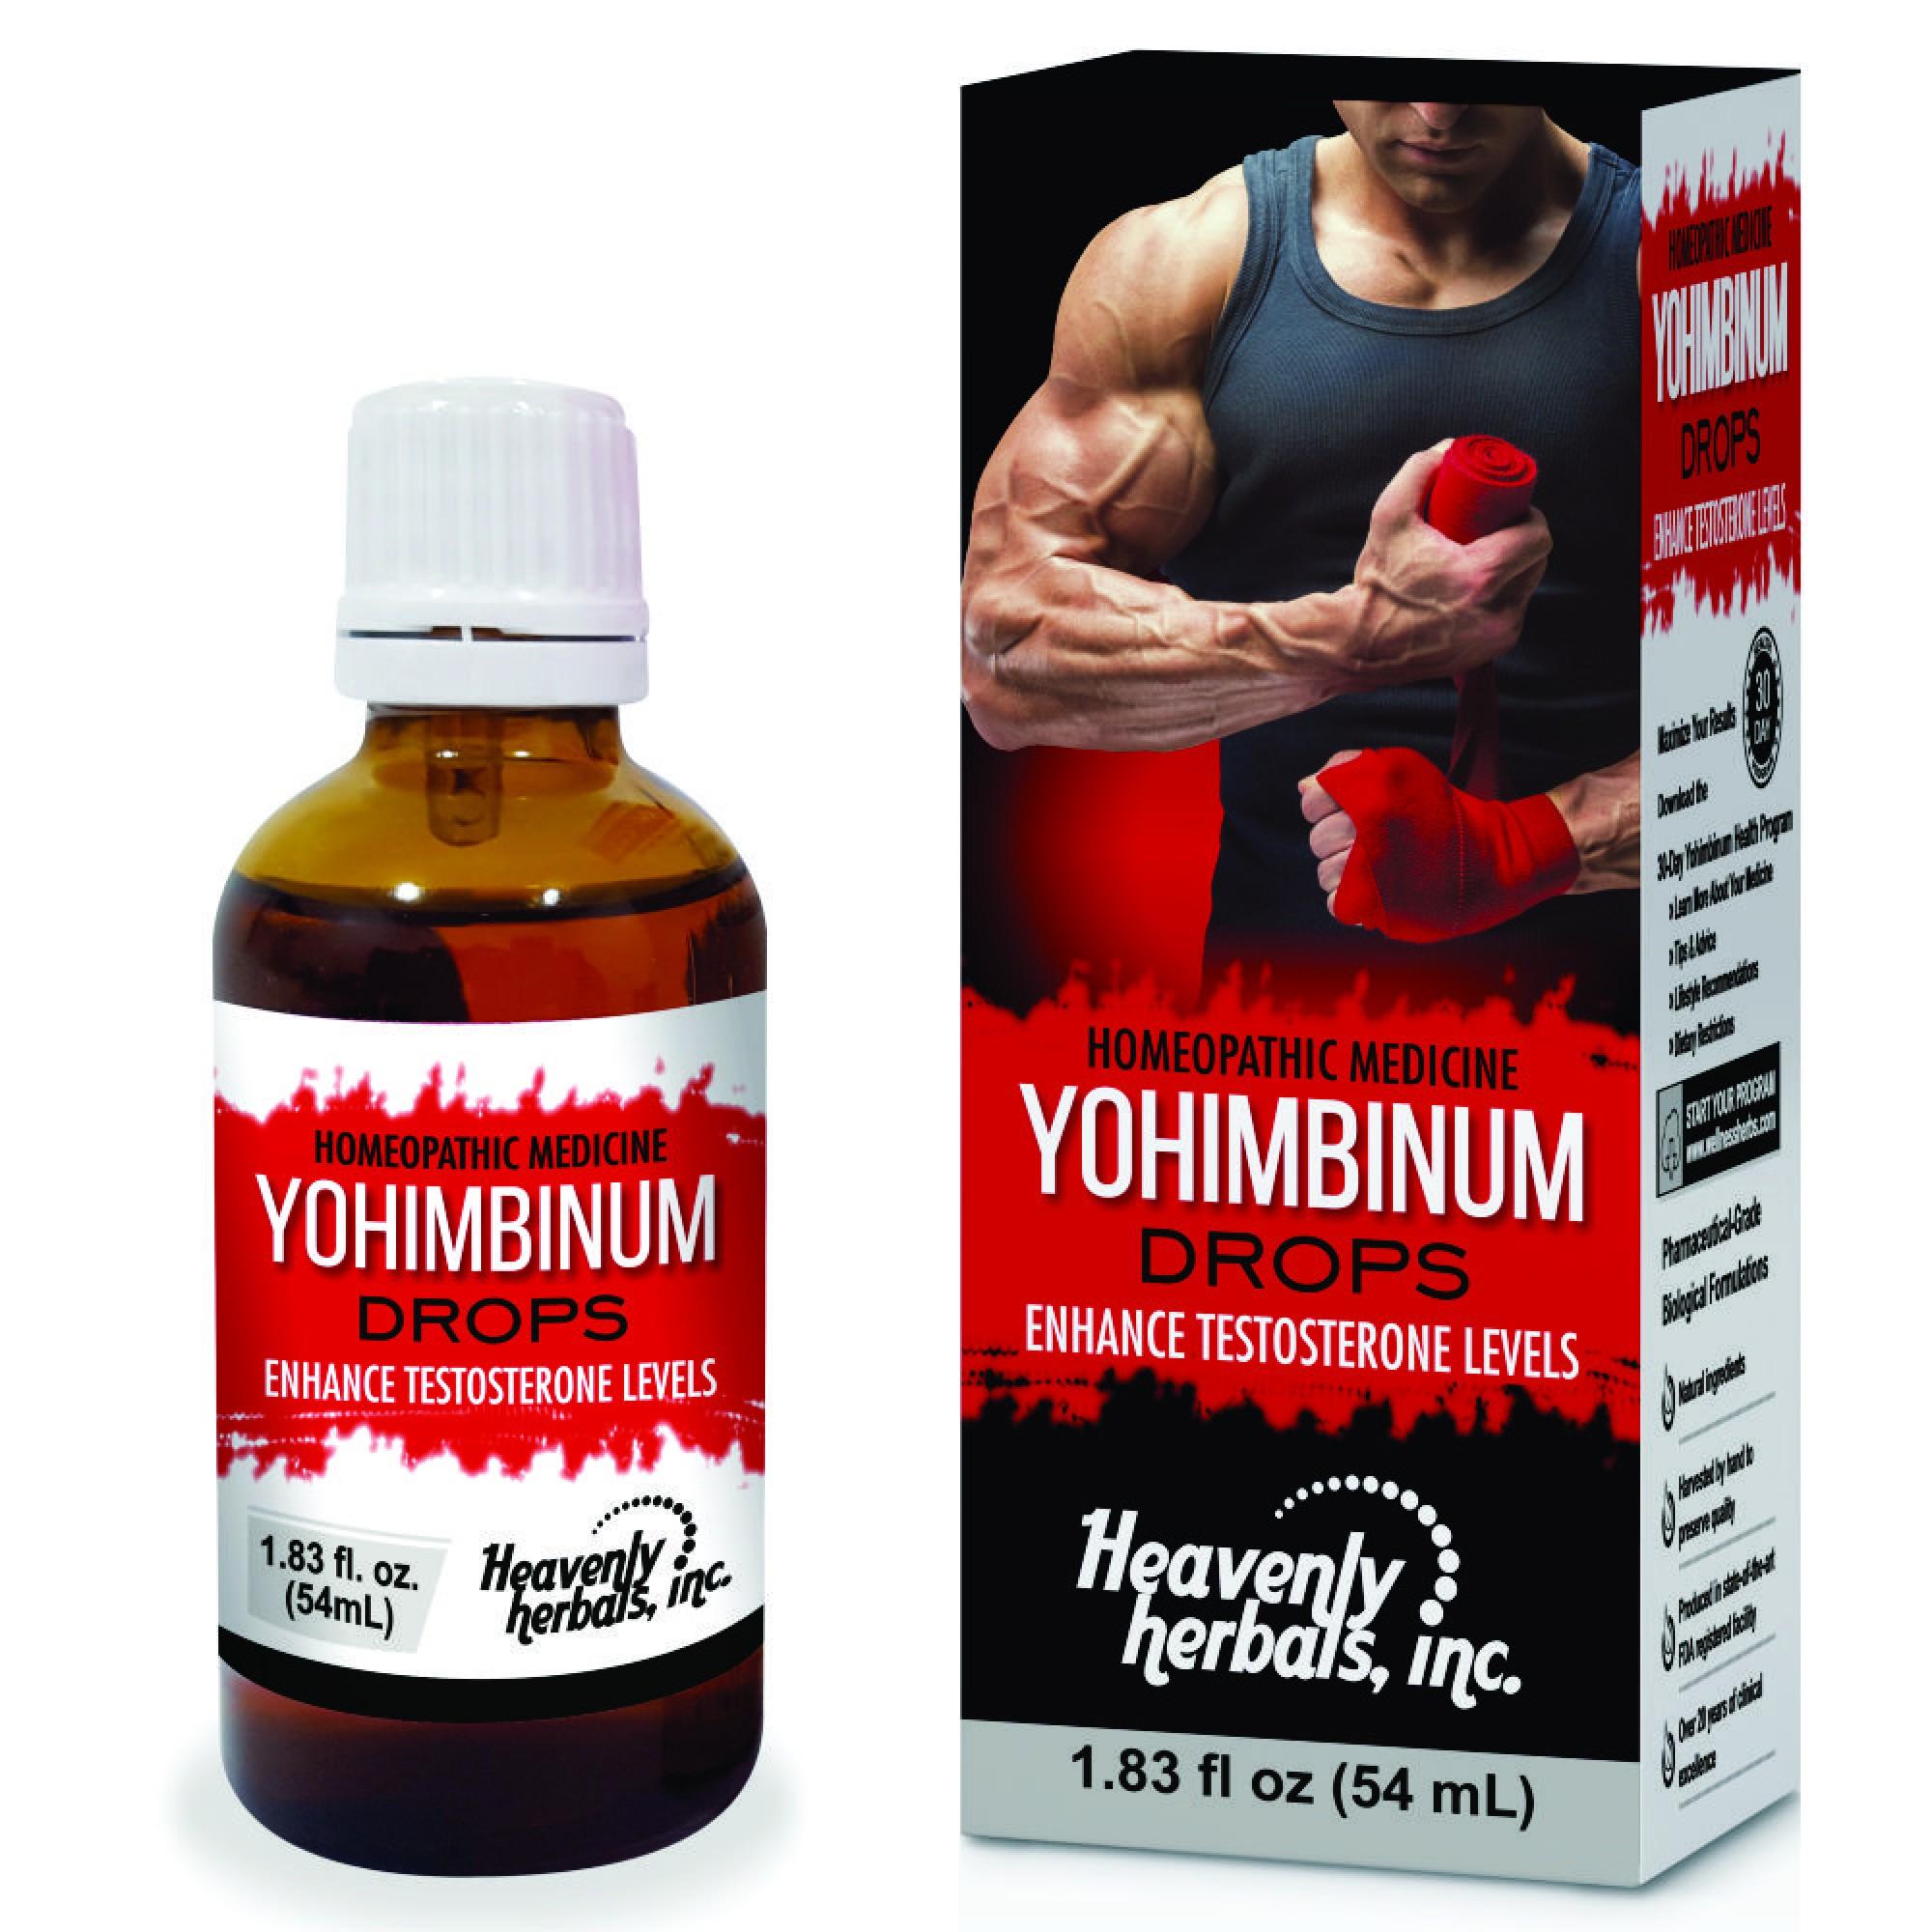 Yohimbinum Drops